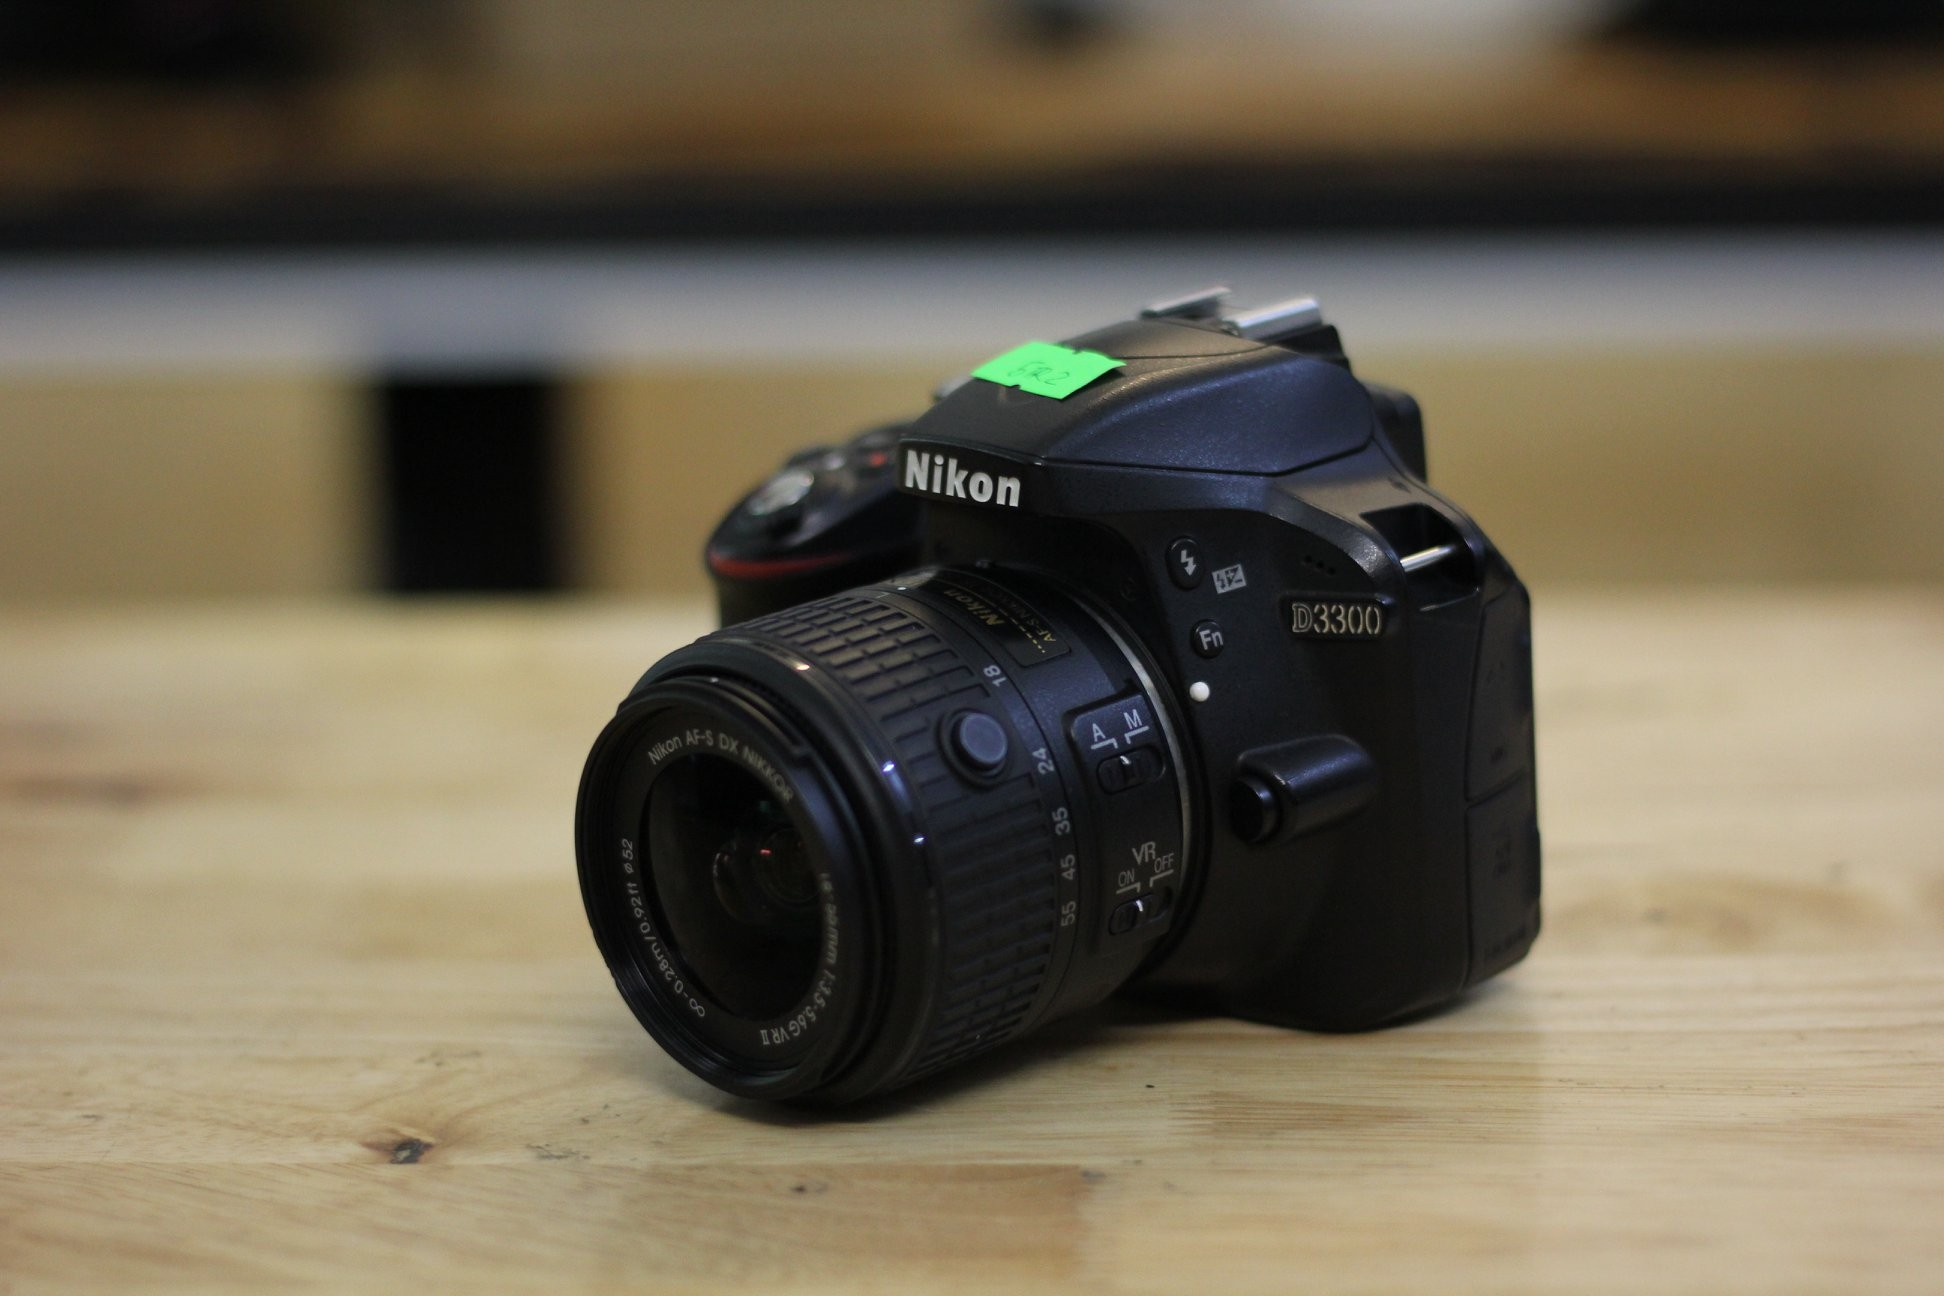 Máy ảnh Nikon DSRL D3300